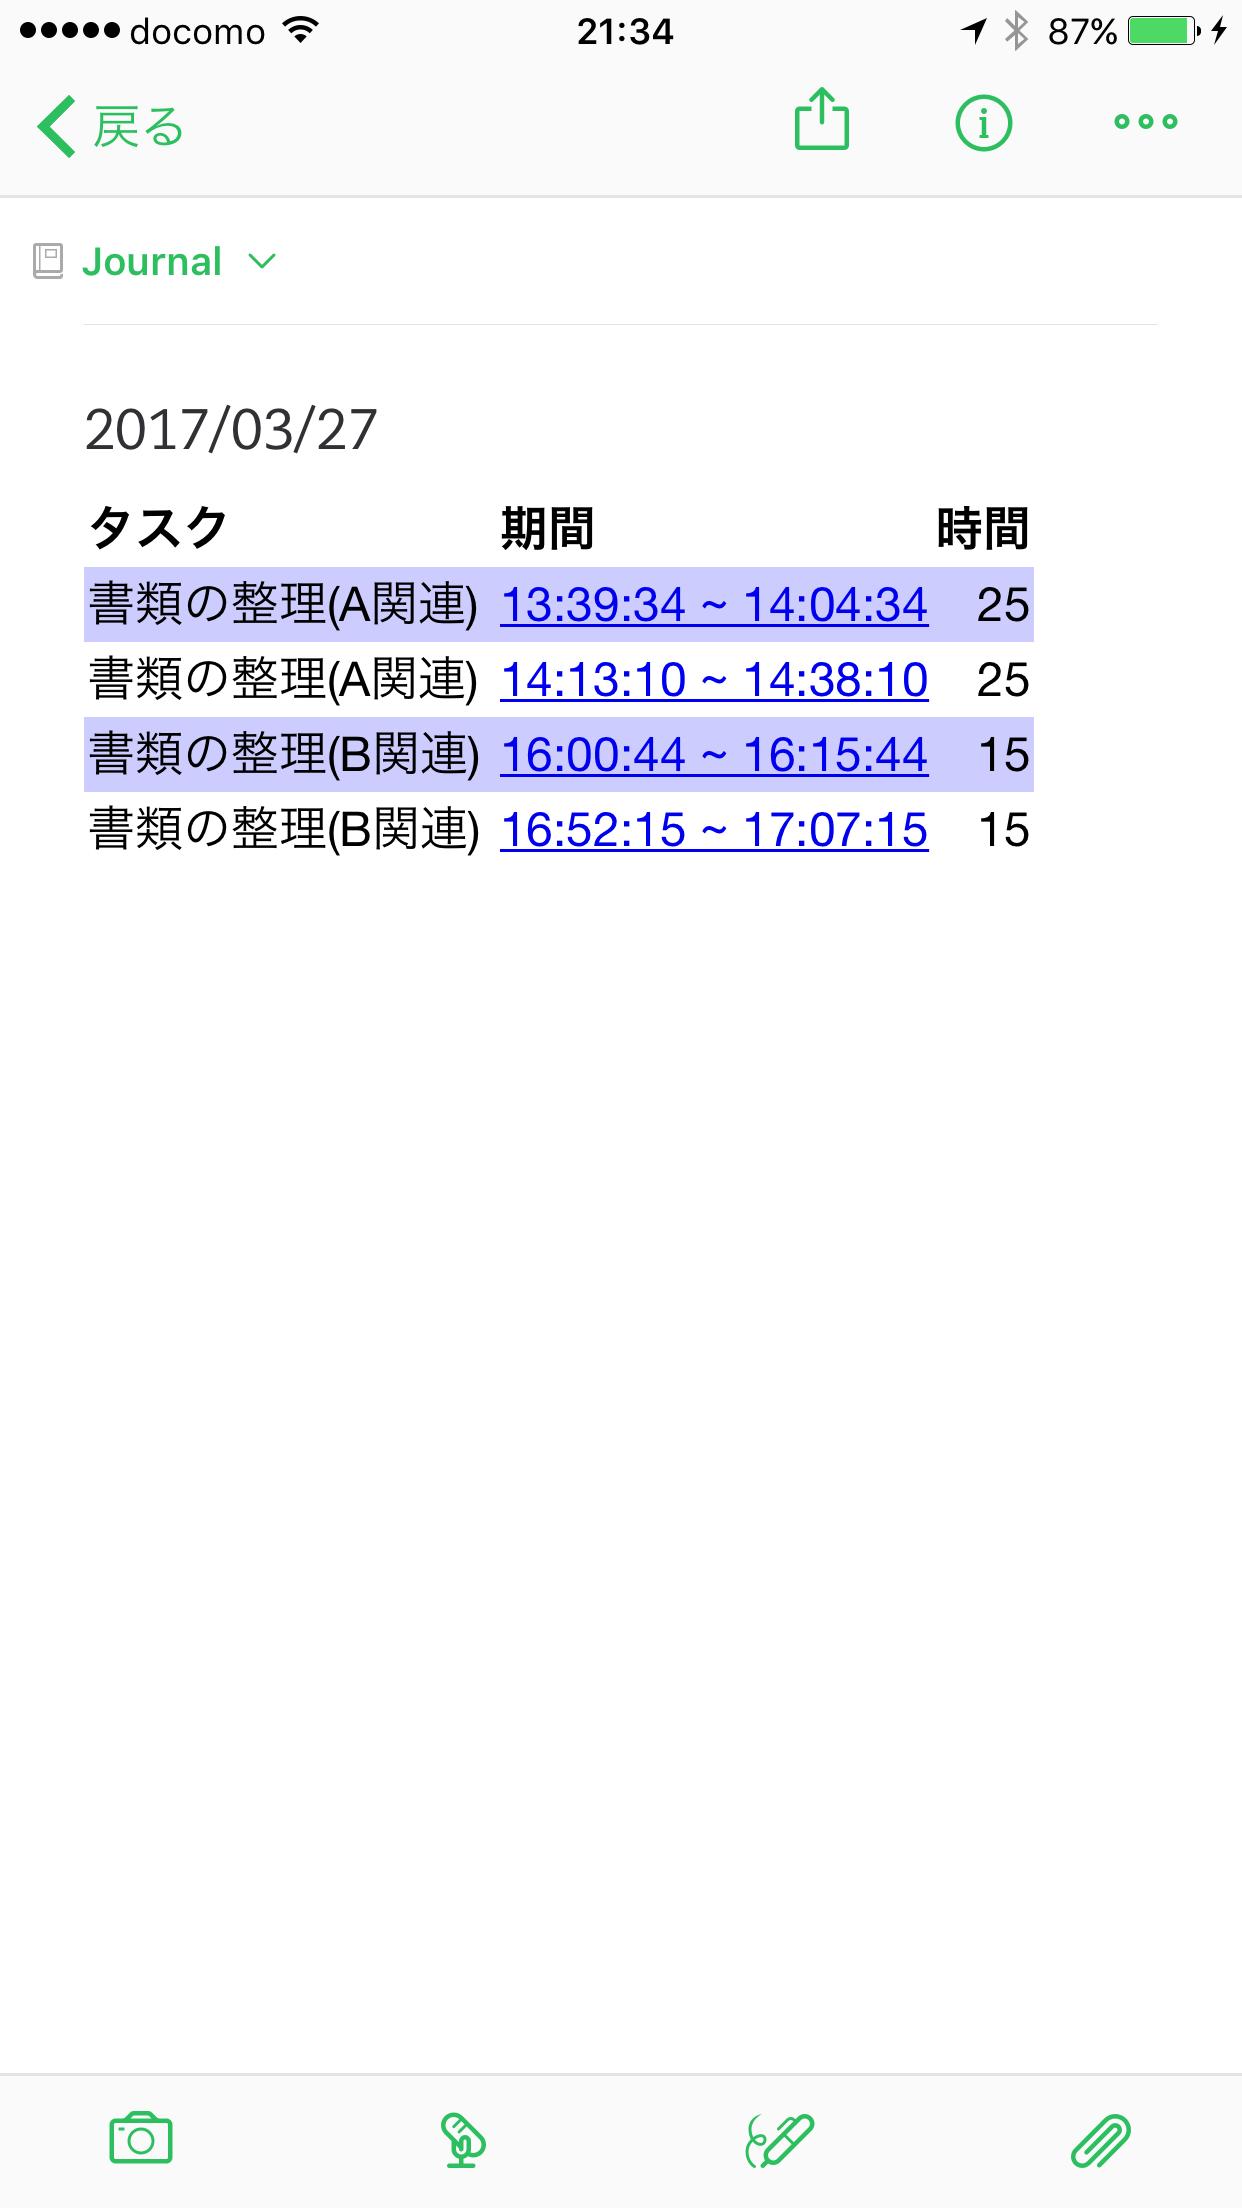 f:id:sorashima:20170329213615p:plain:w414